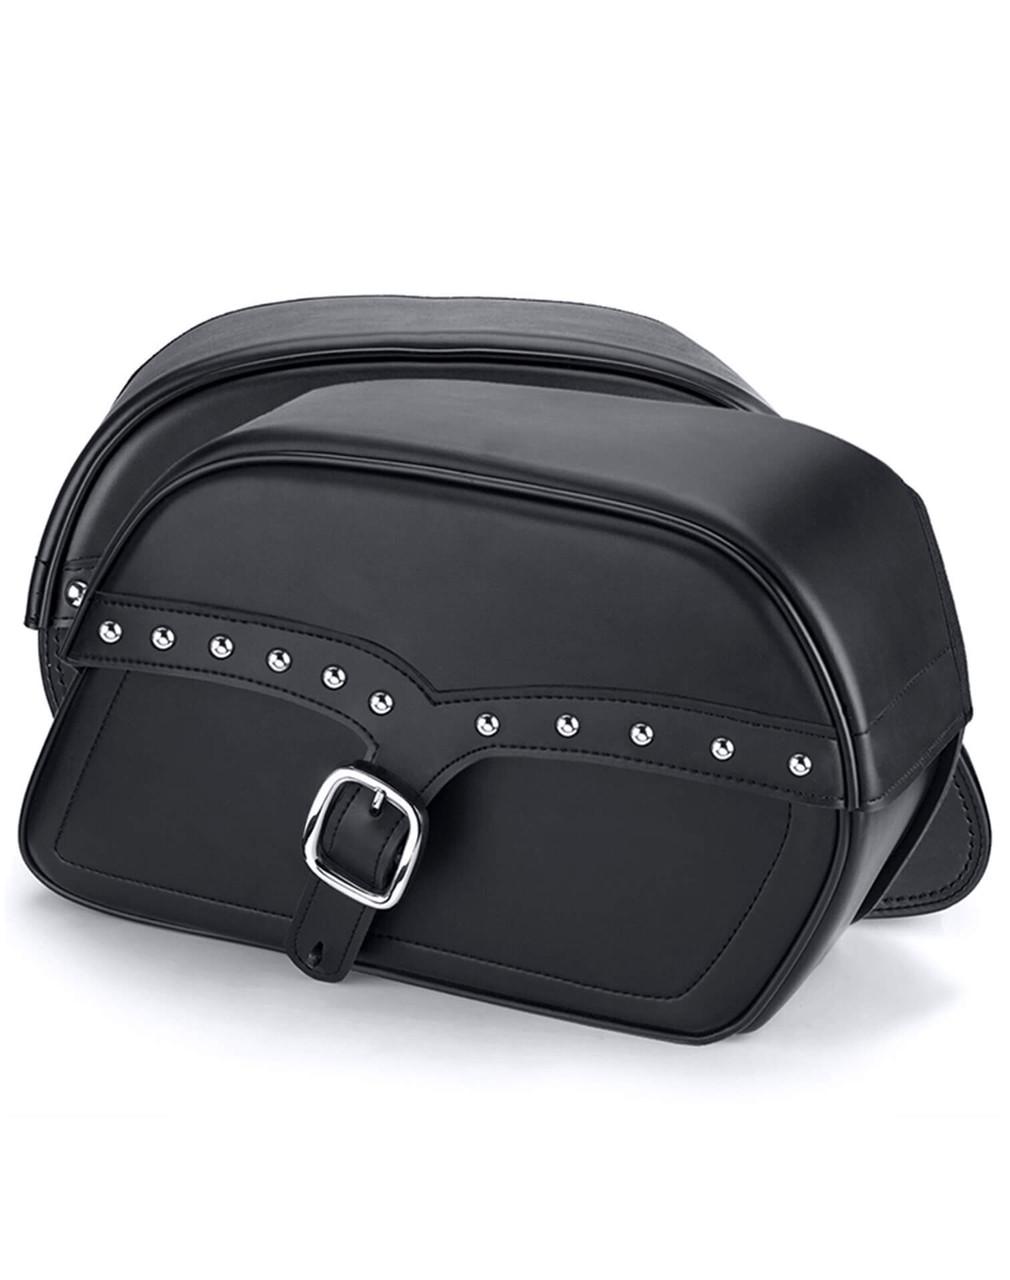 Honda 1500 Valkyrie Interstate SS Slanted Studded Medium Motorcycle Saddlebags Both Bags View